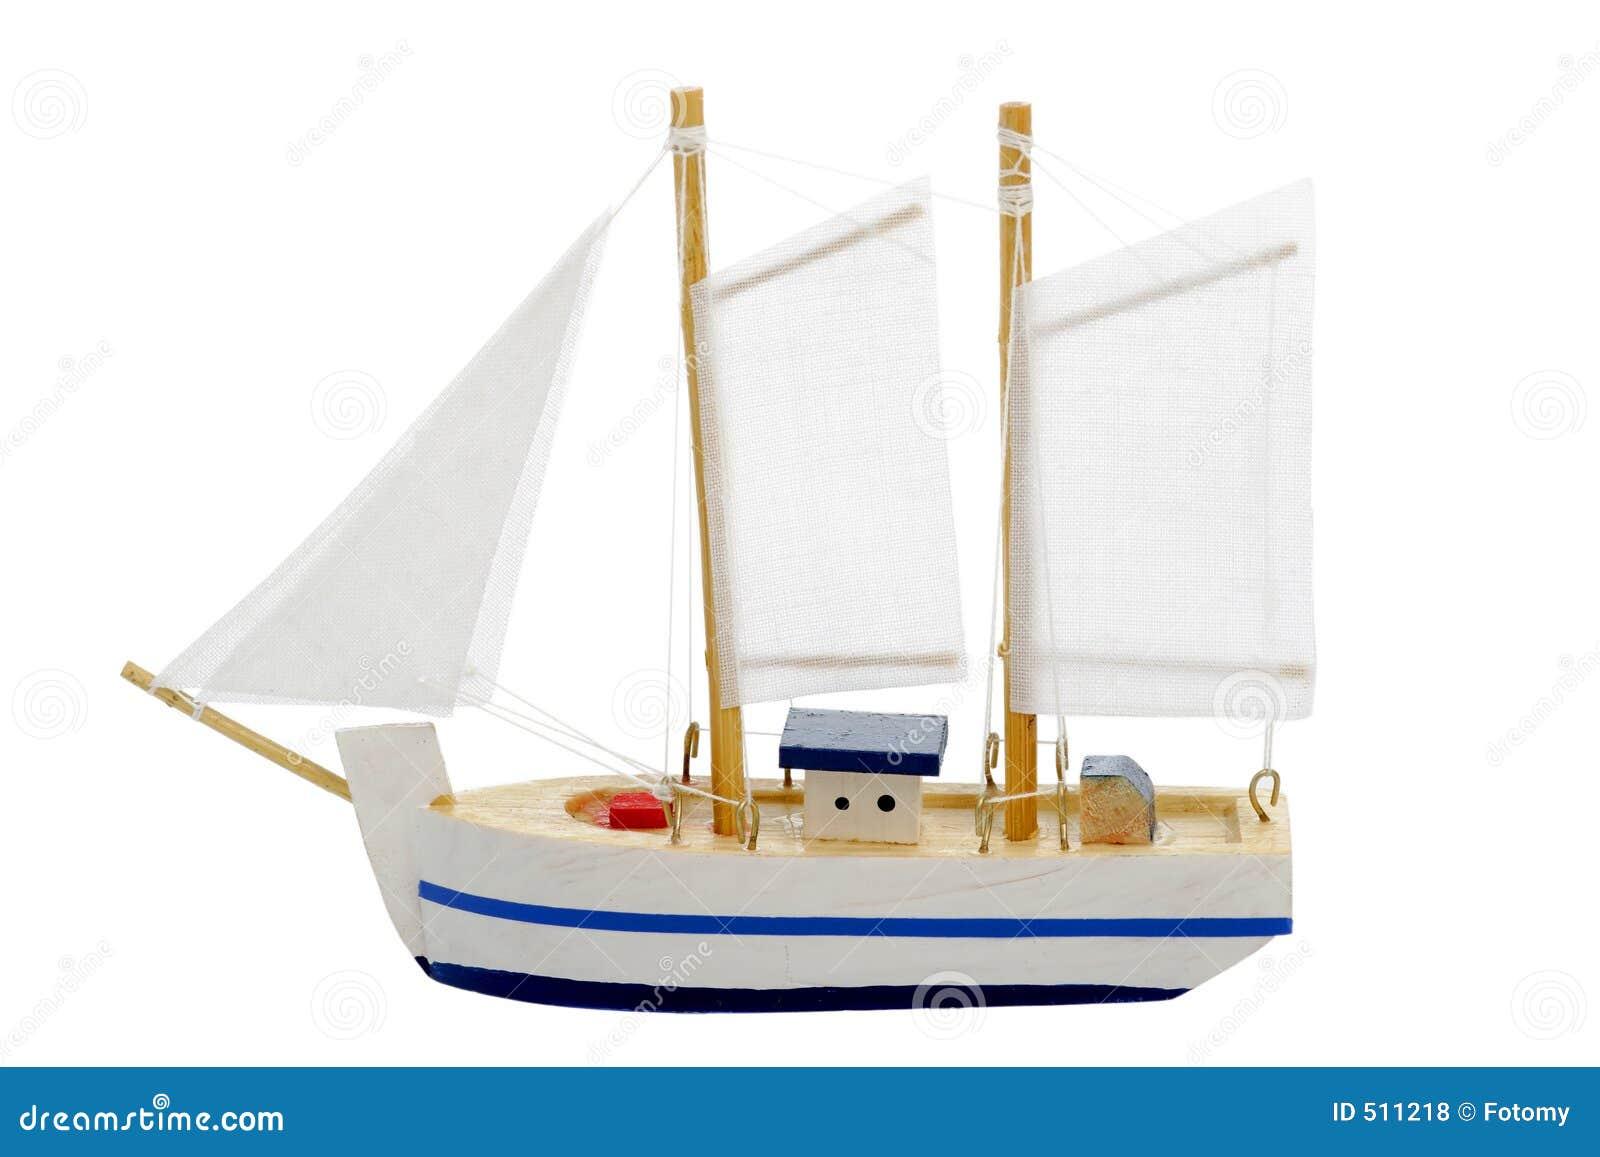 Toy Sailing Boat Royalty Free Stock Photos - Image: 511218